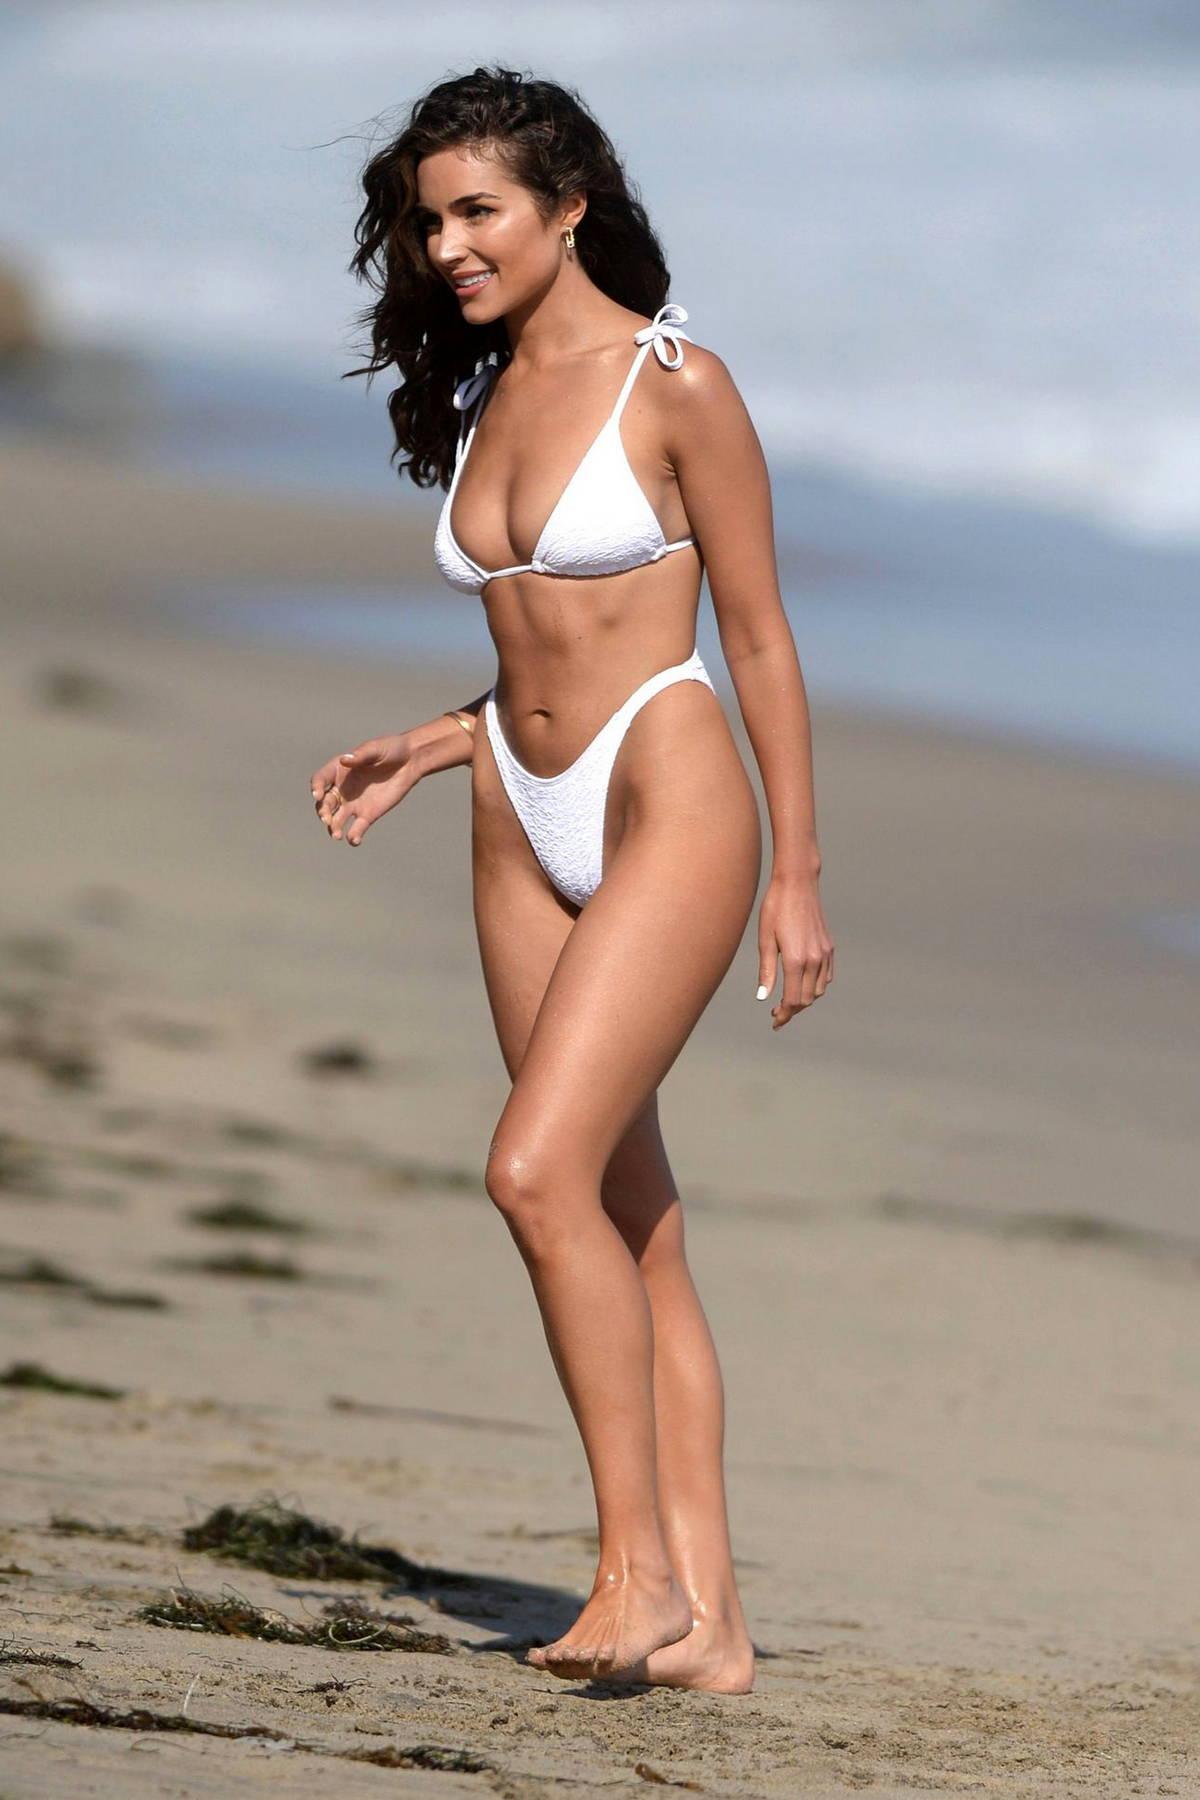 Olivia Culpo looks stunning in a white bikini while enjoying the beach with her pup in in Malibu, California